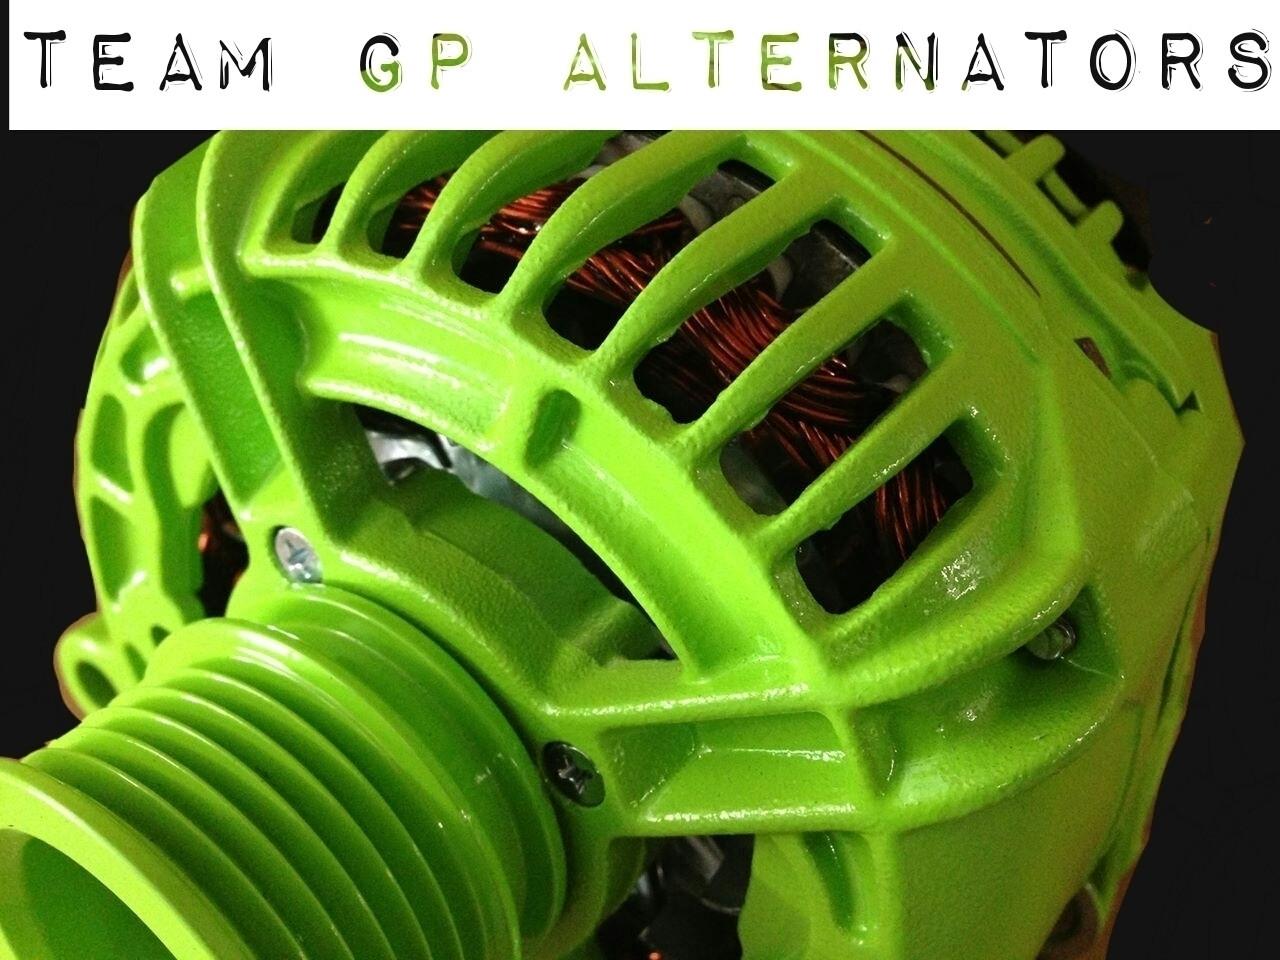 MITSUBISHI MONTERO 3.0L -1998- 200AMP TEAM GP Alternator